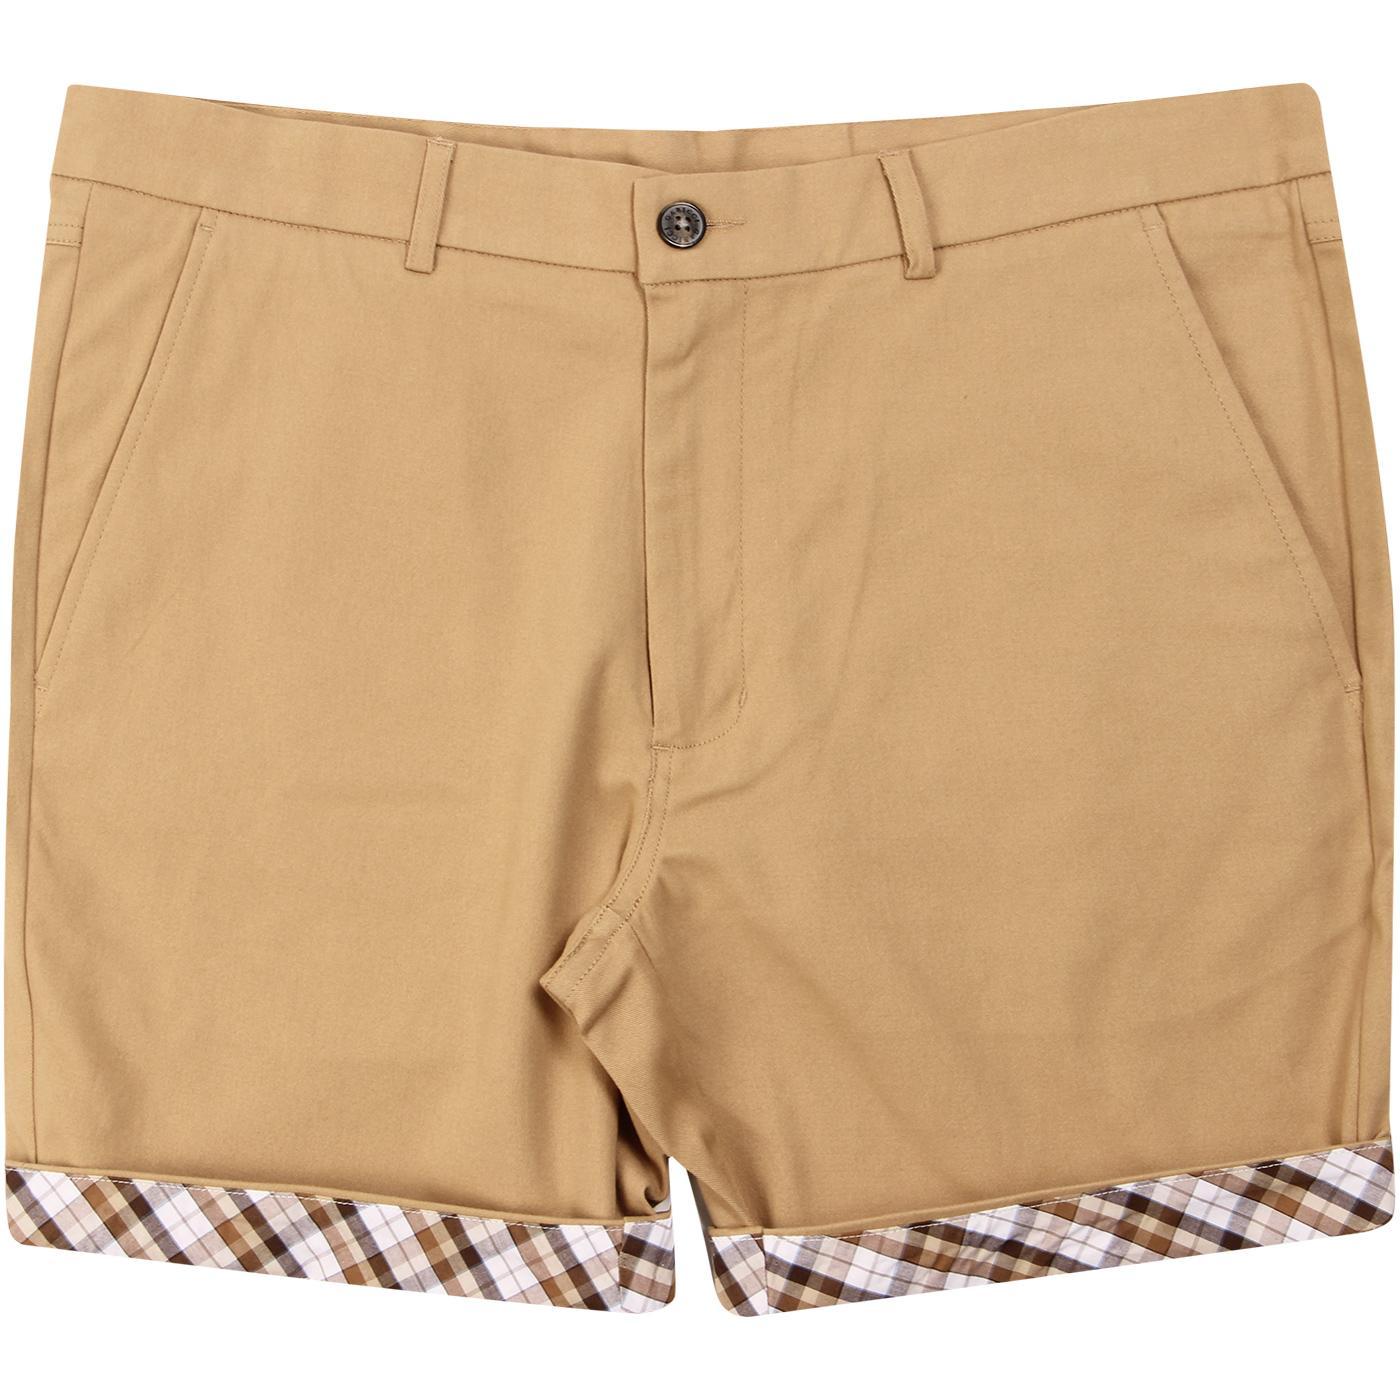 Cooper GABICCI VINTAGE Retro Check Trim Shorts (B)